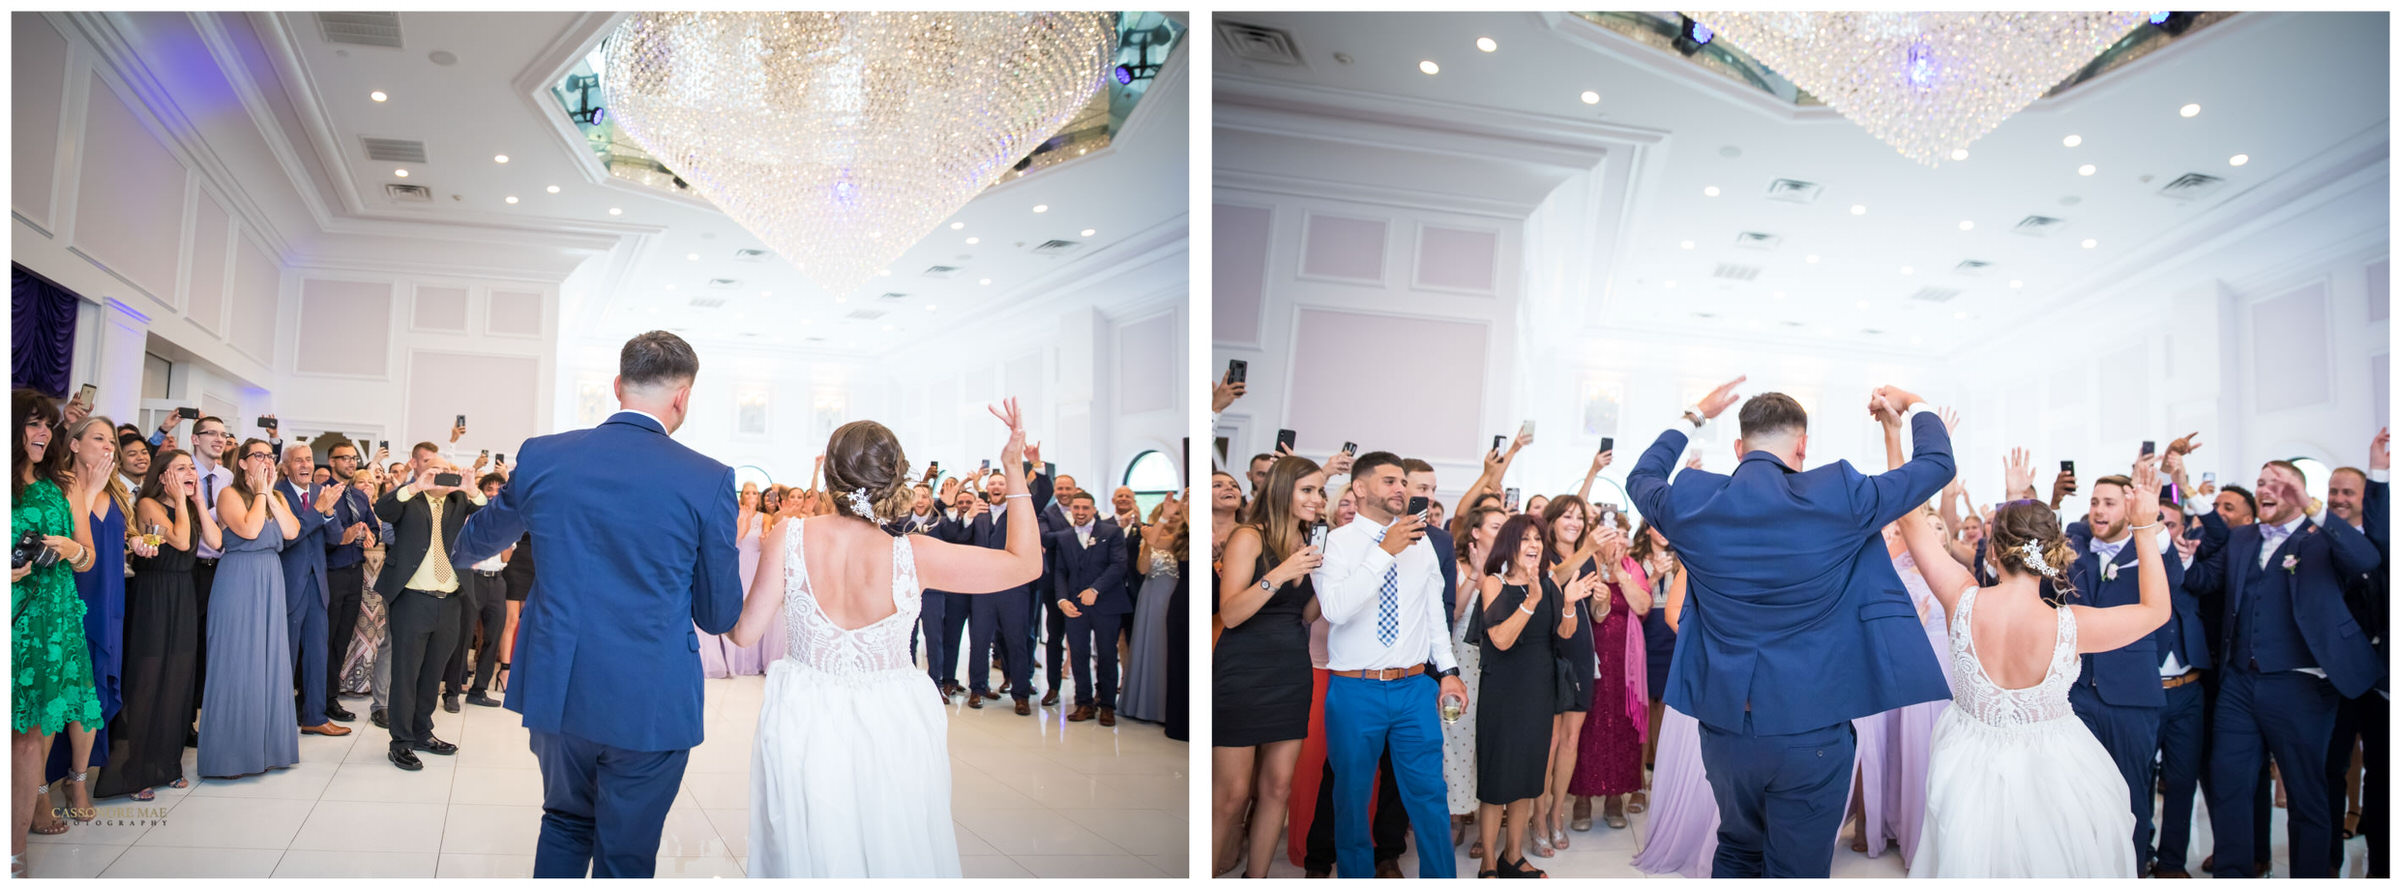 Cassondre Mae Photography Villa Venezia Wedding Photographer 39.jpg